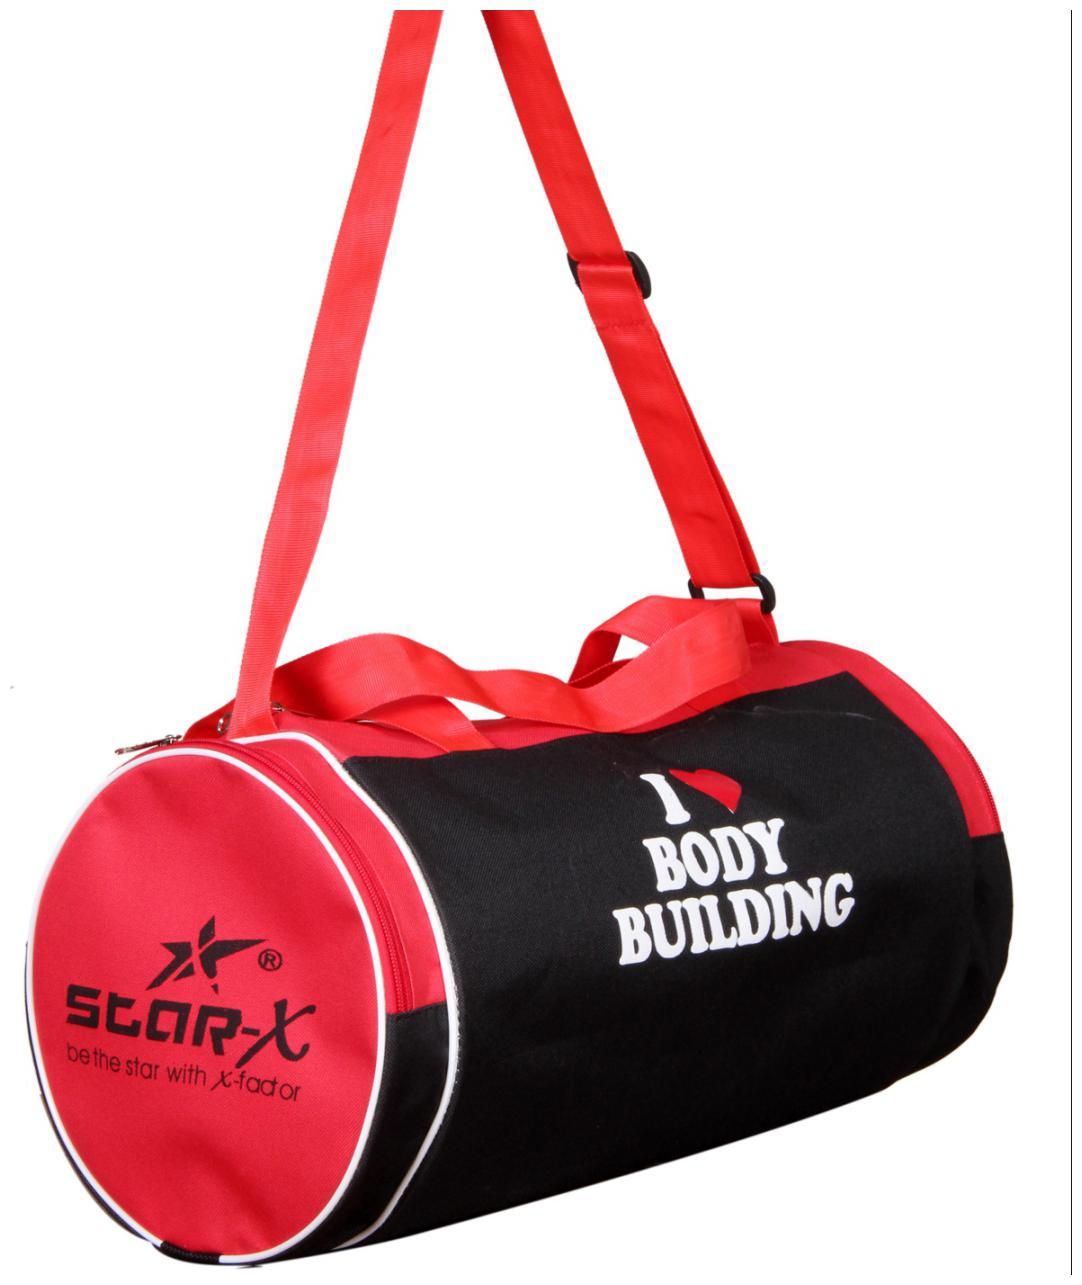 STAR X Multipurpose Gym bag